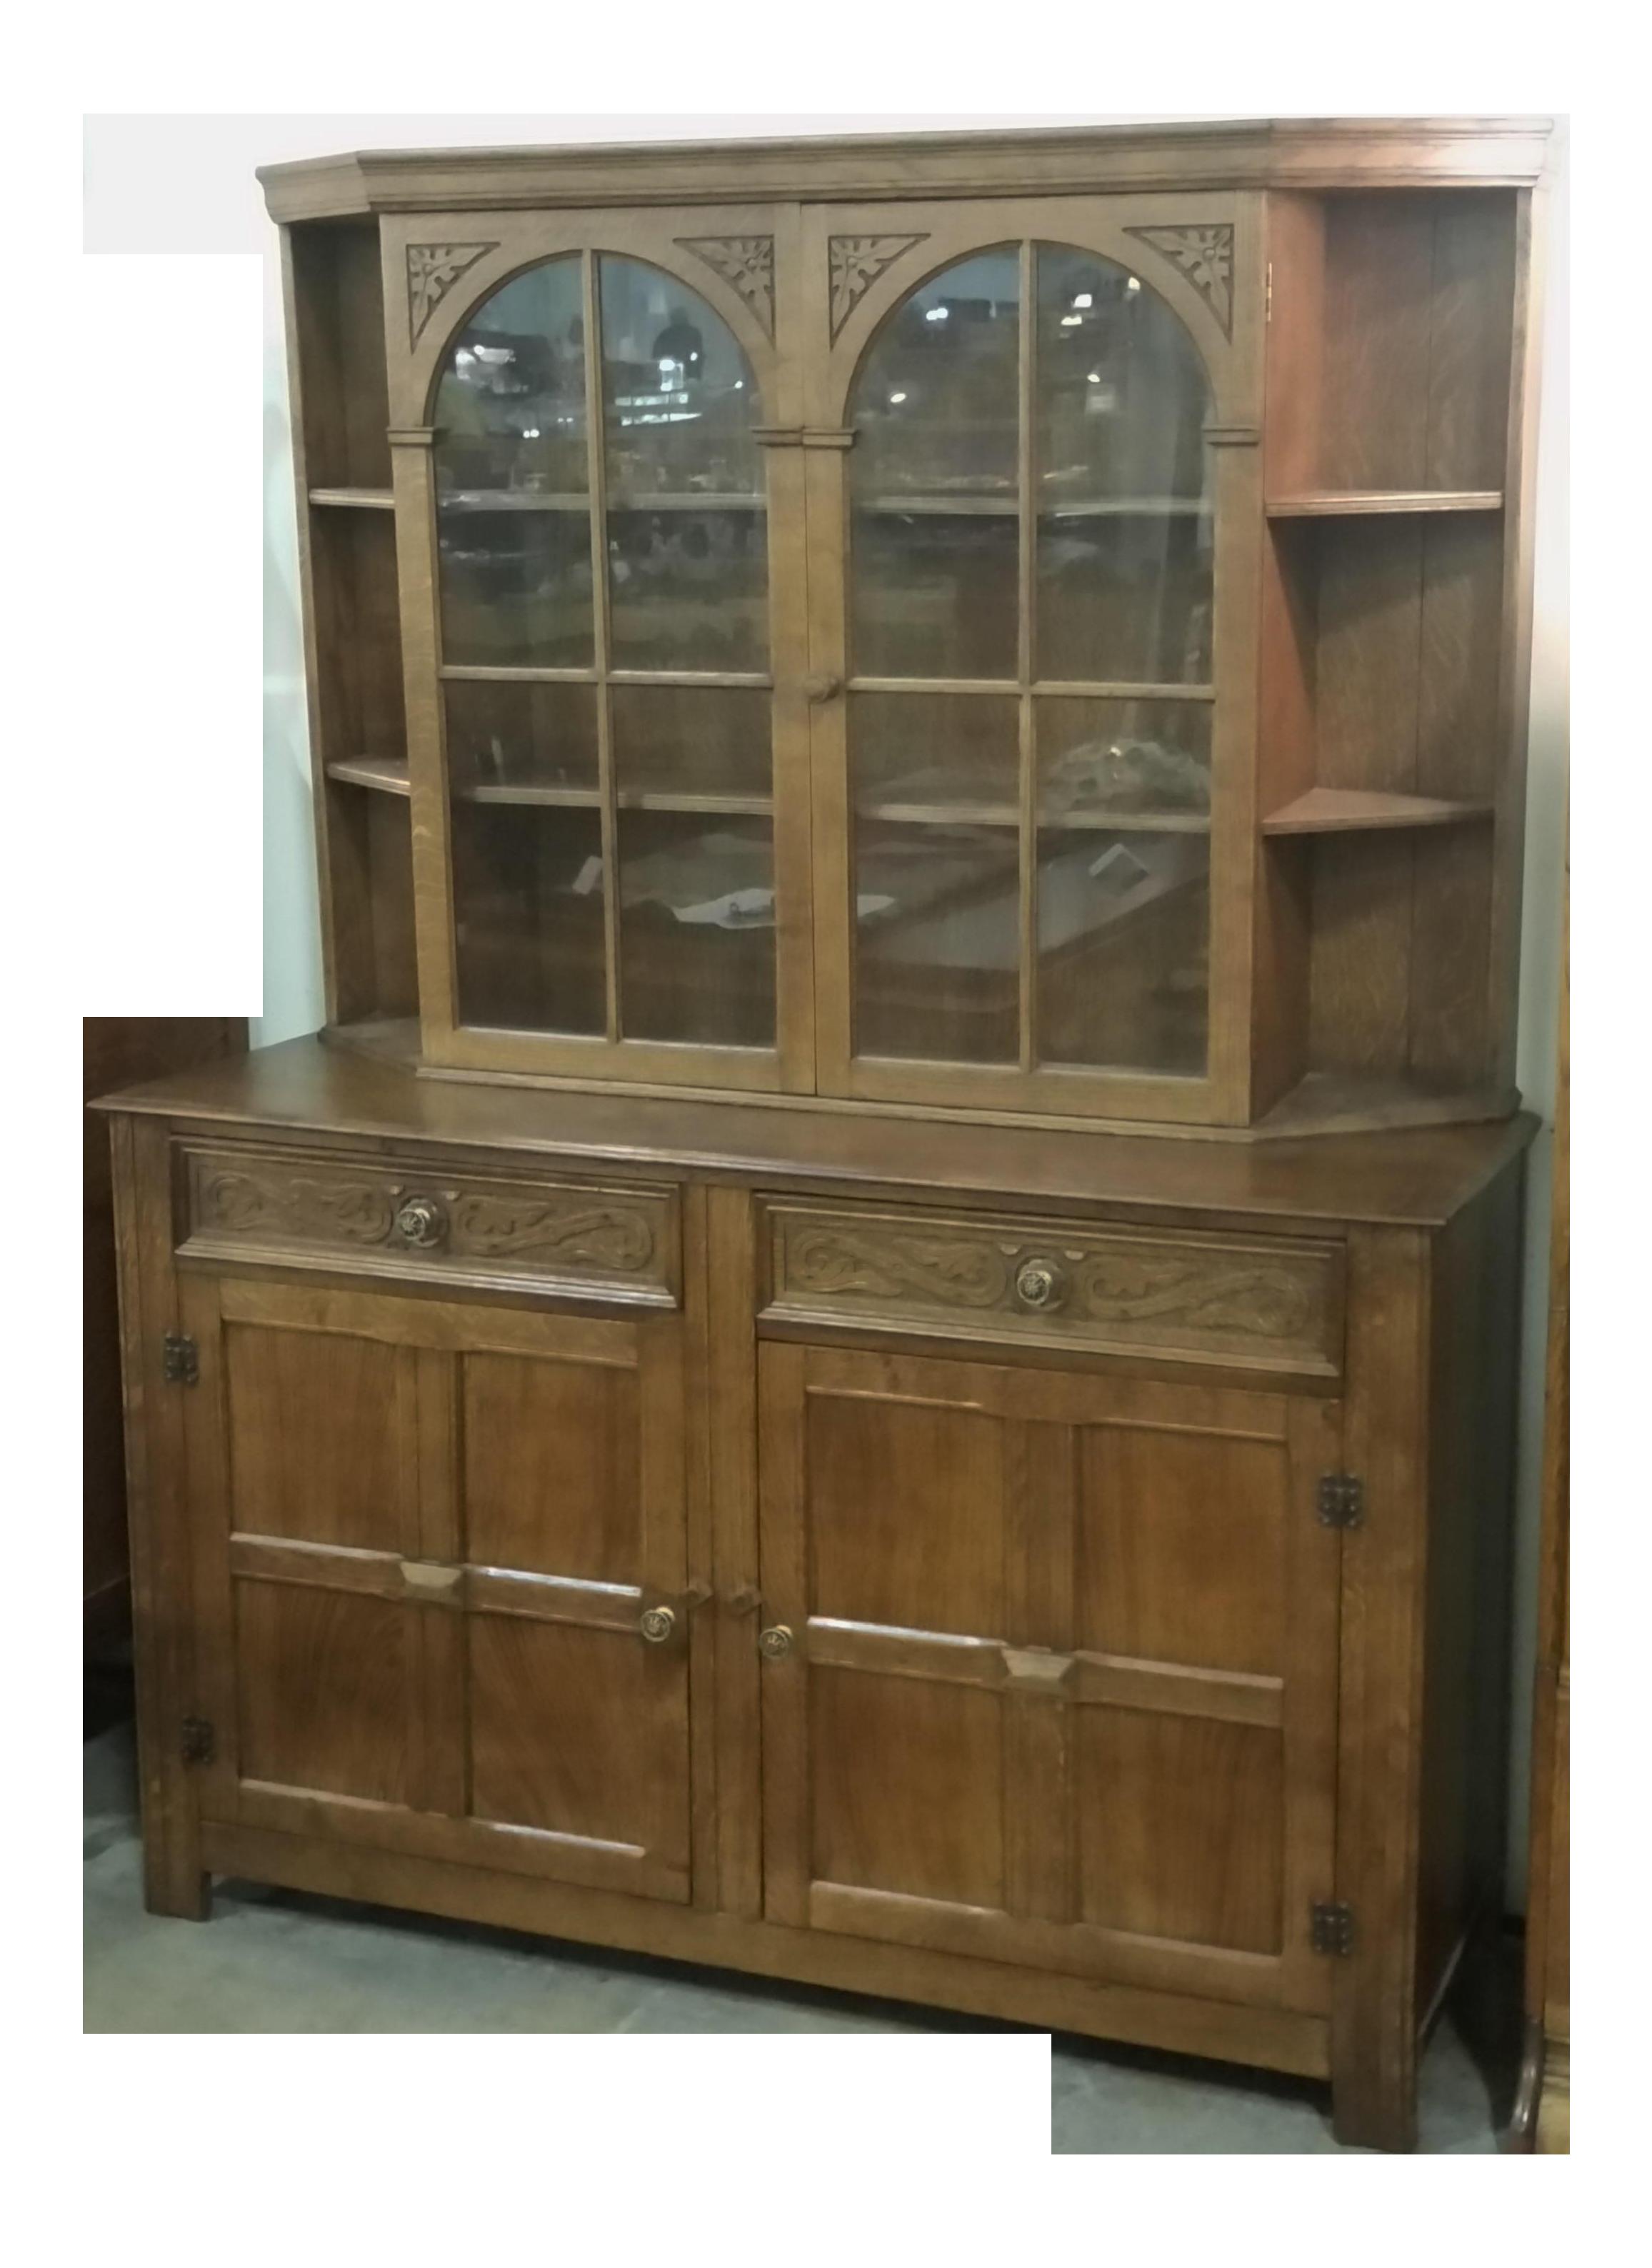 Vintage English Oak Buffet Display Cabinet Hutch Sideboard For Sale